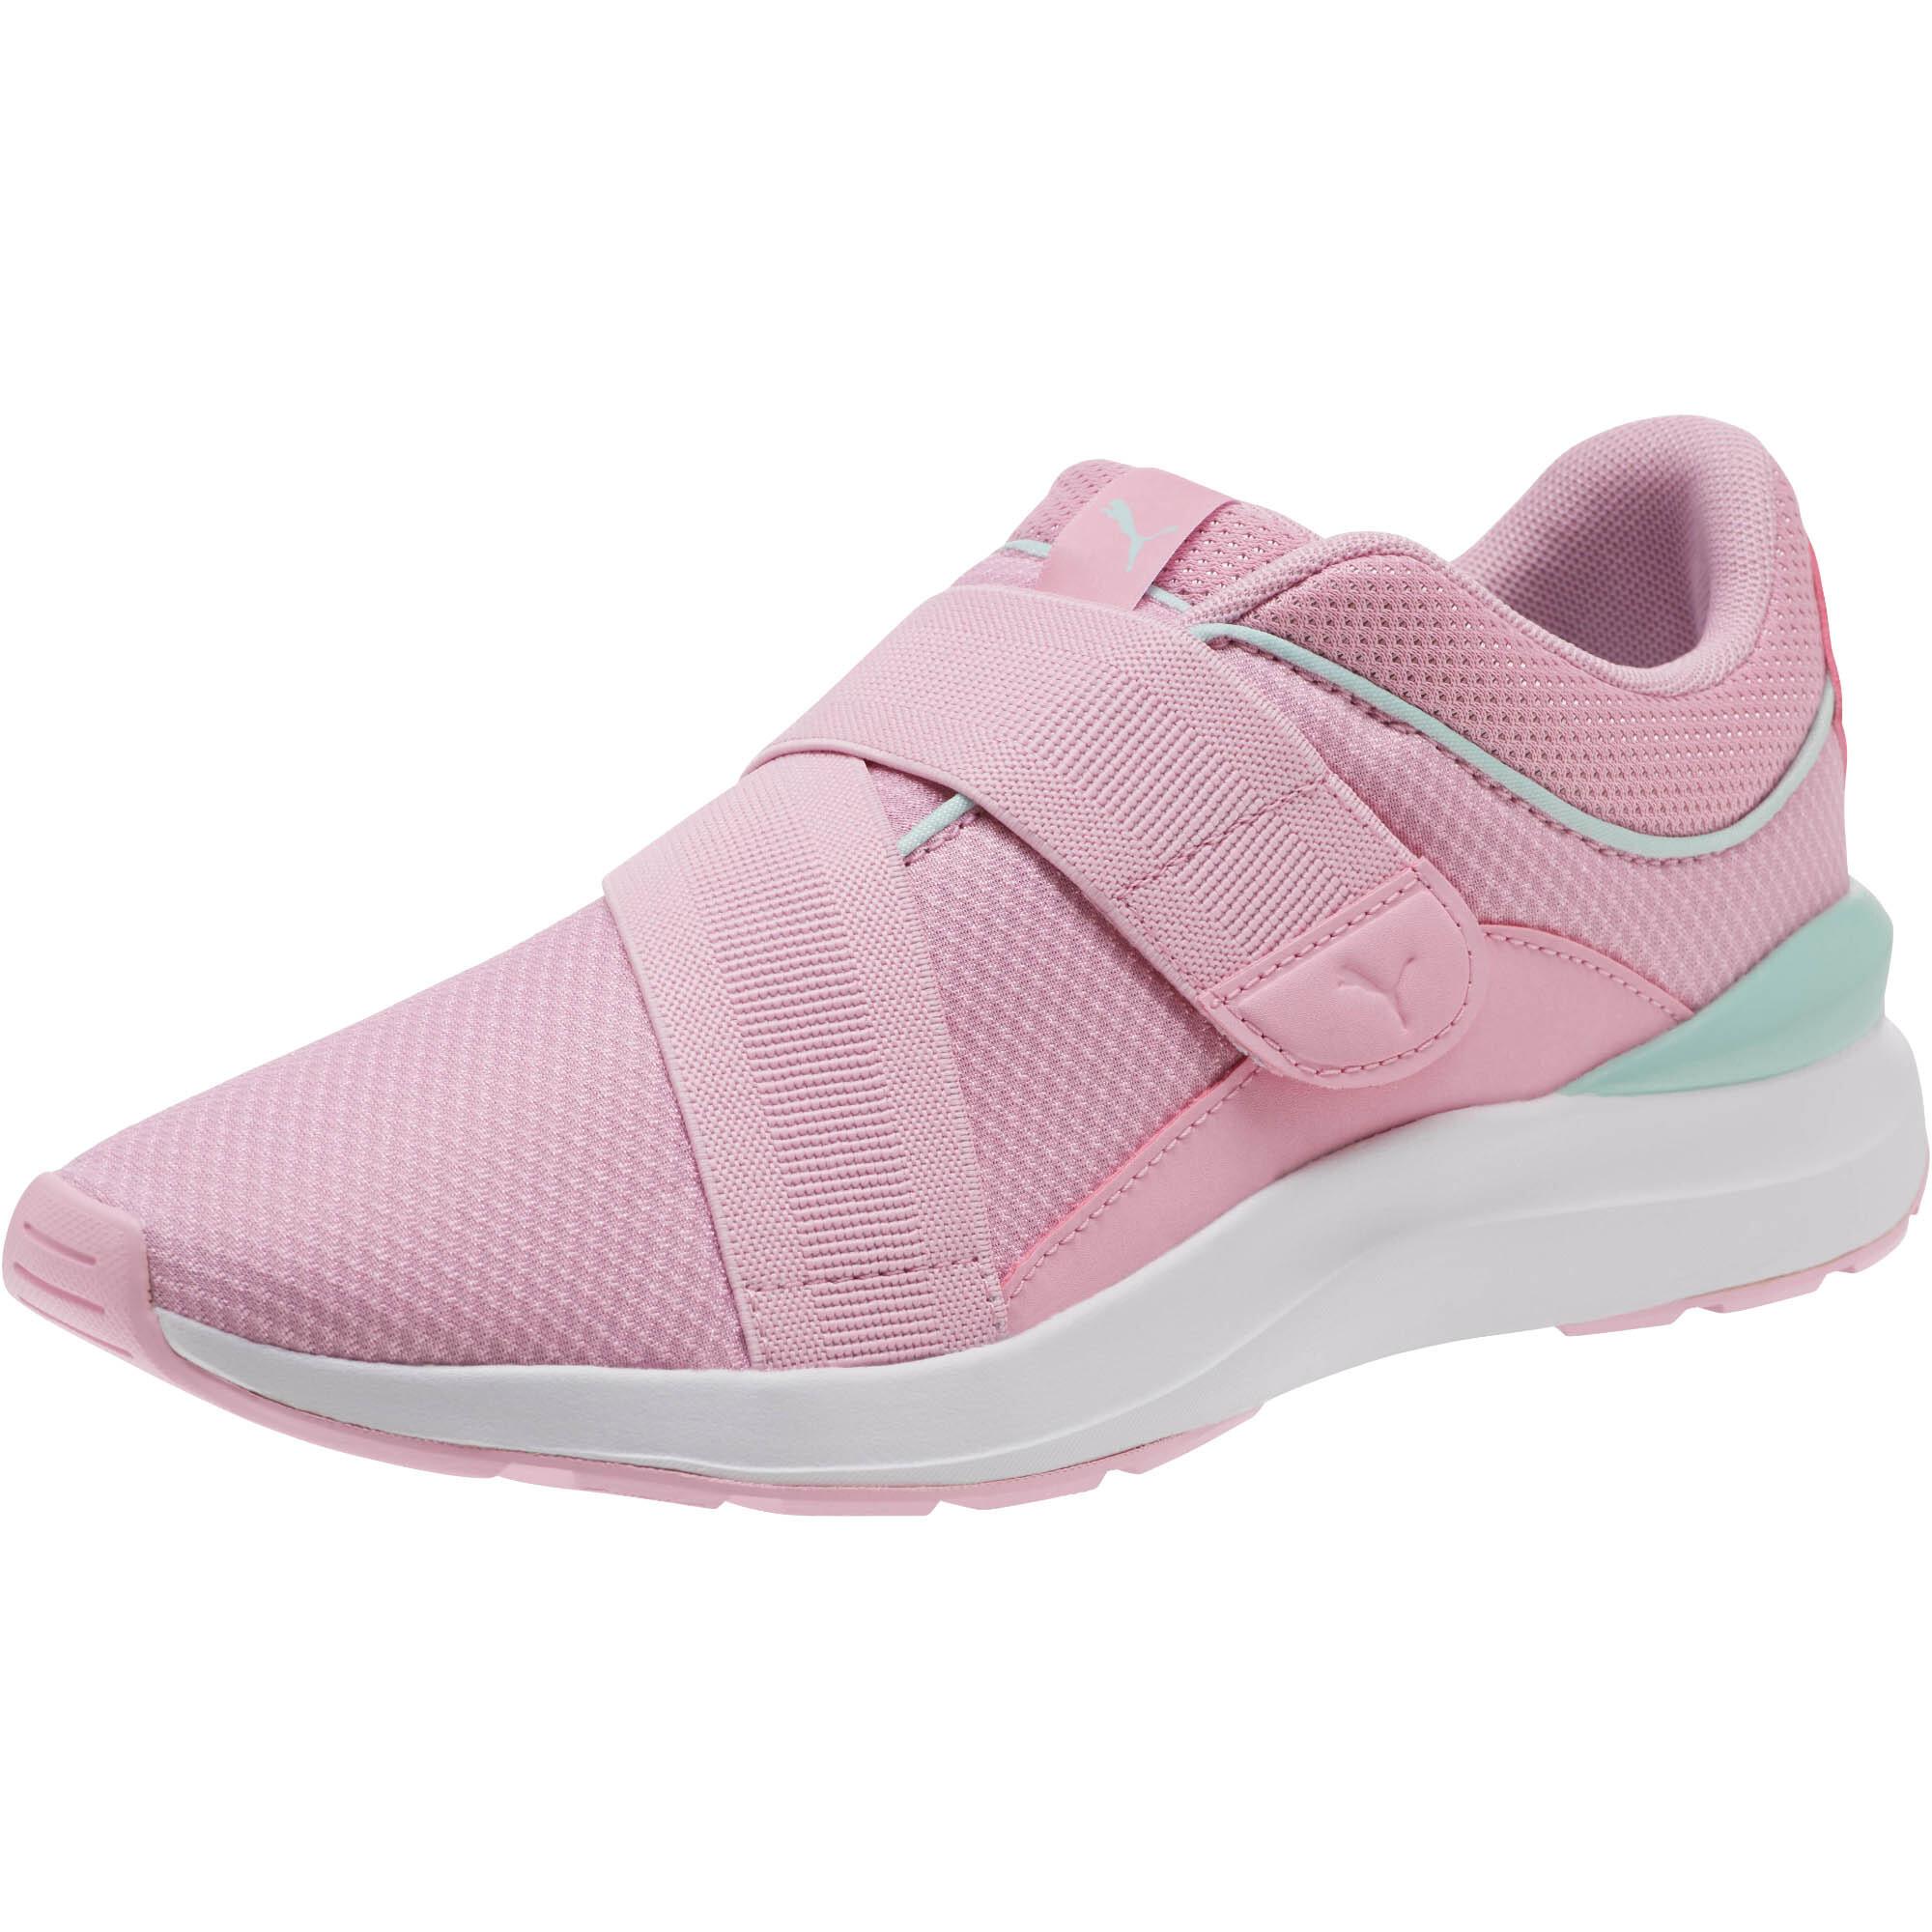 PUMA-Adela-X-Women-s-Sneakers-Women-Shoe-Basics thumbnail 4